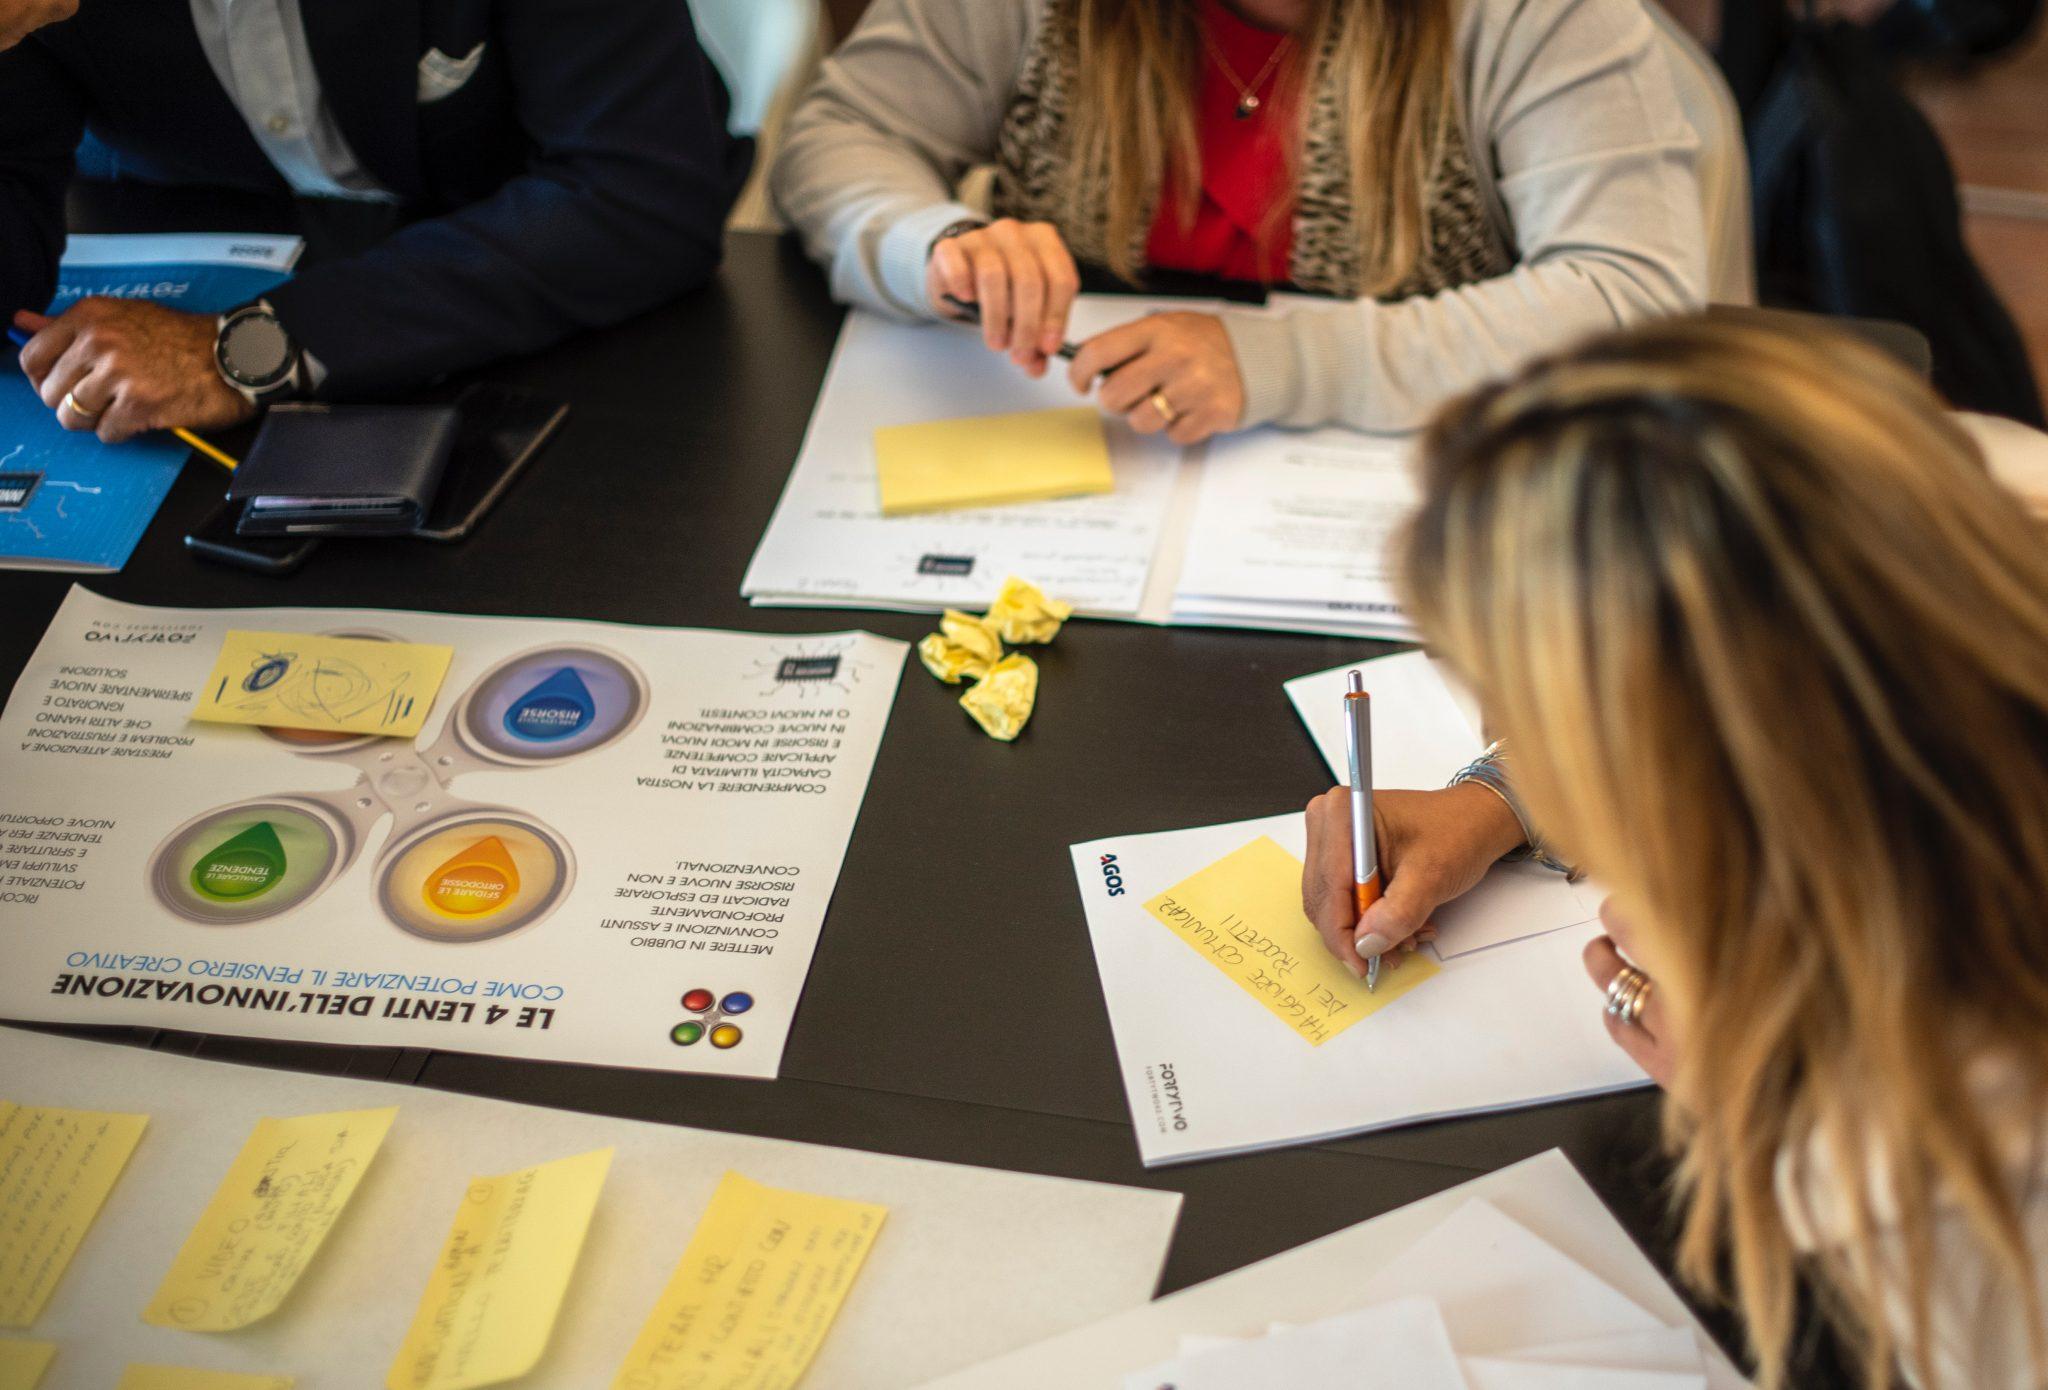 Kostnadsfri workshop i Entreprenörskap